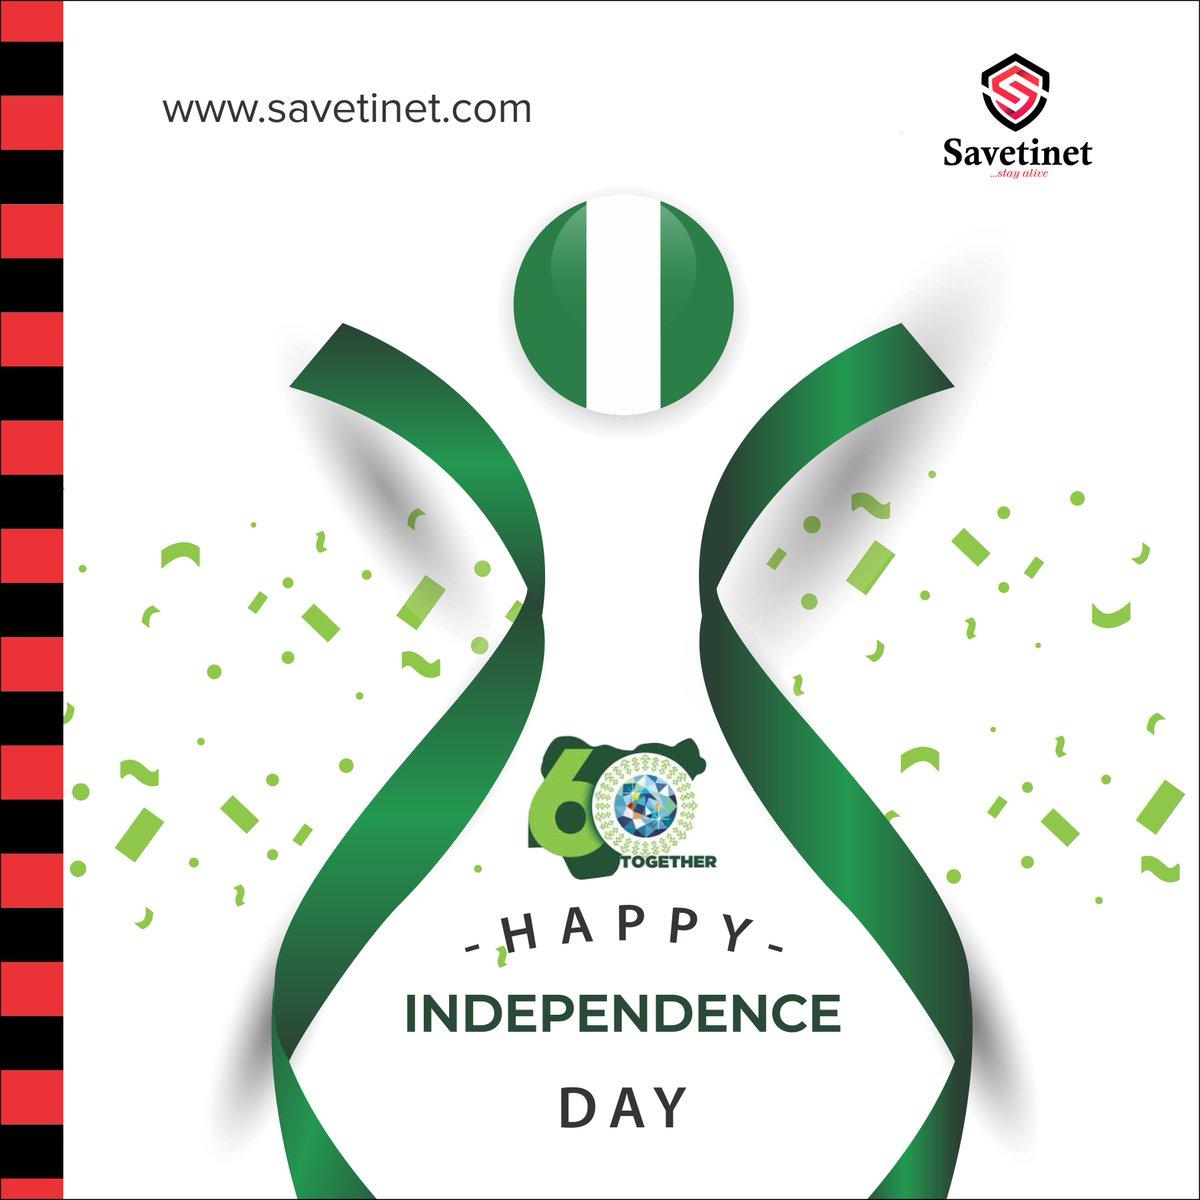 HAPPY INDEPENDENCE DAY NIGERIA!!! #independenceday #thofjuly #october #nigeriaat60 #october #freedom #nigeria #happy #fireworks #love #independence #happyindependenceday #greenwhitegreen #nigerian #instagram #instagood #patriotic #family #summer #celebration #holiday #bhfyp https://t.co/WdHkUG6Ki7